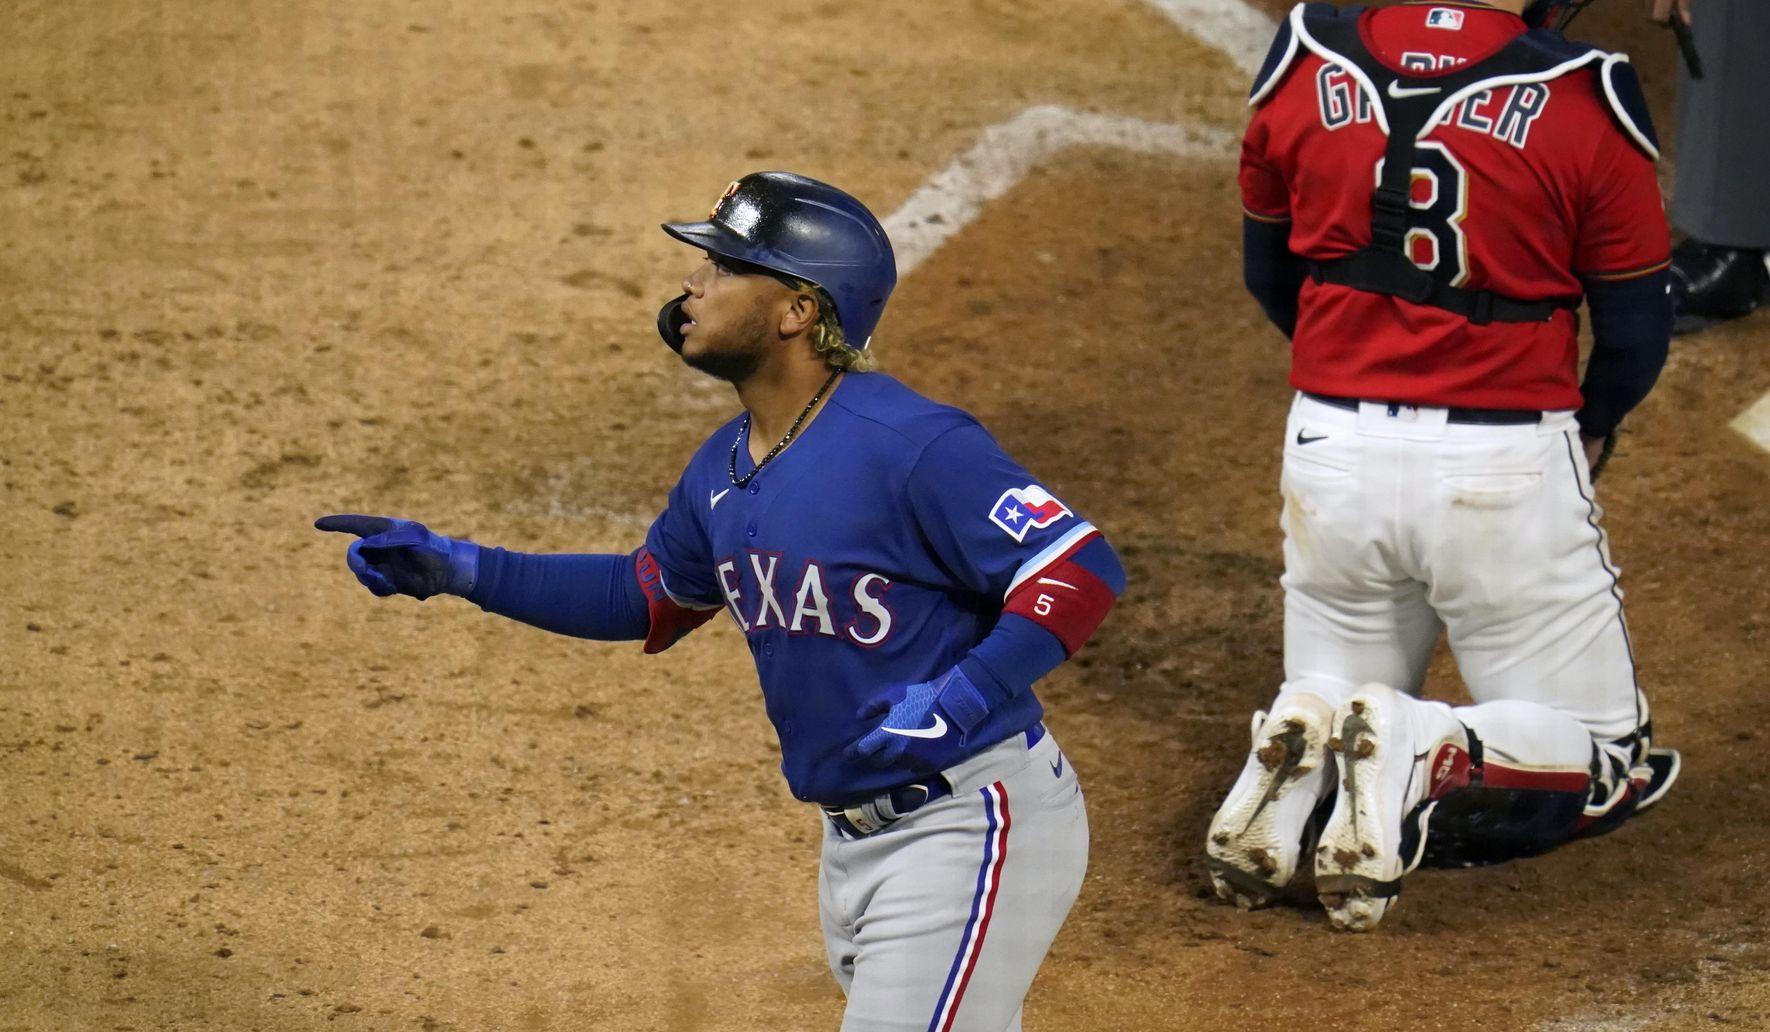 Rangers_twins_baseball_00515_c0-233-5568-3479_s1770x1032